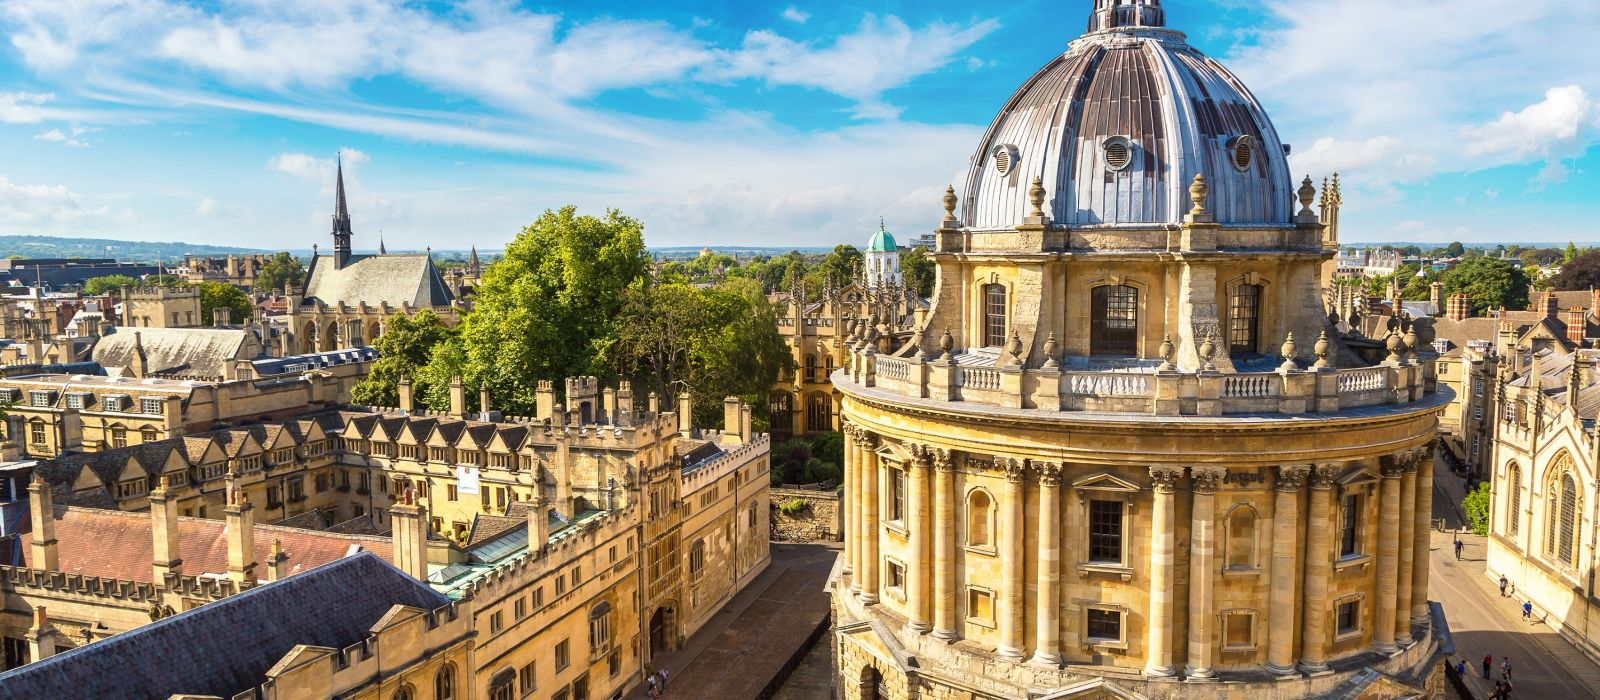 Destination Oxford UK & Ireland